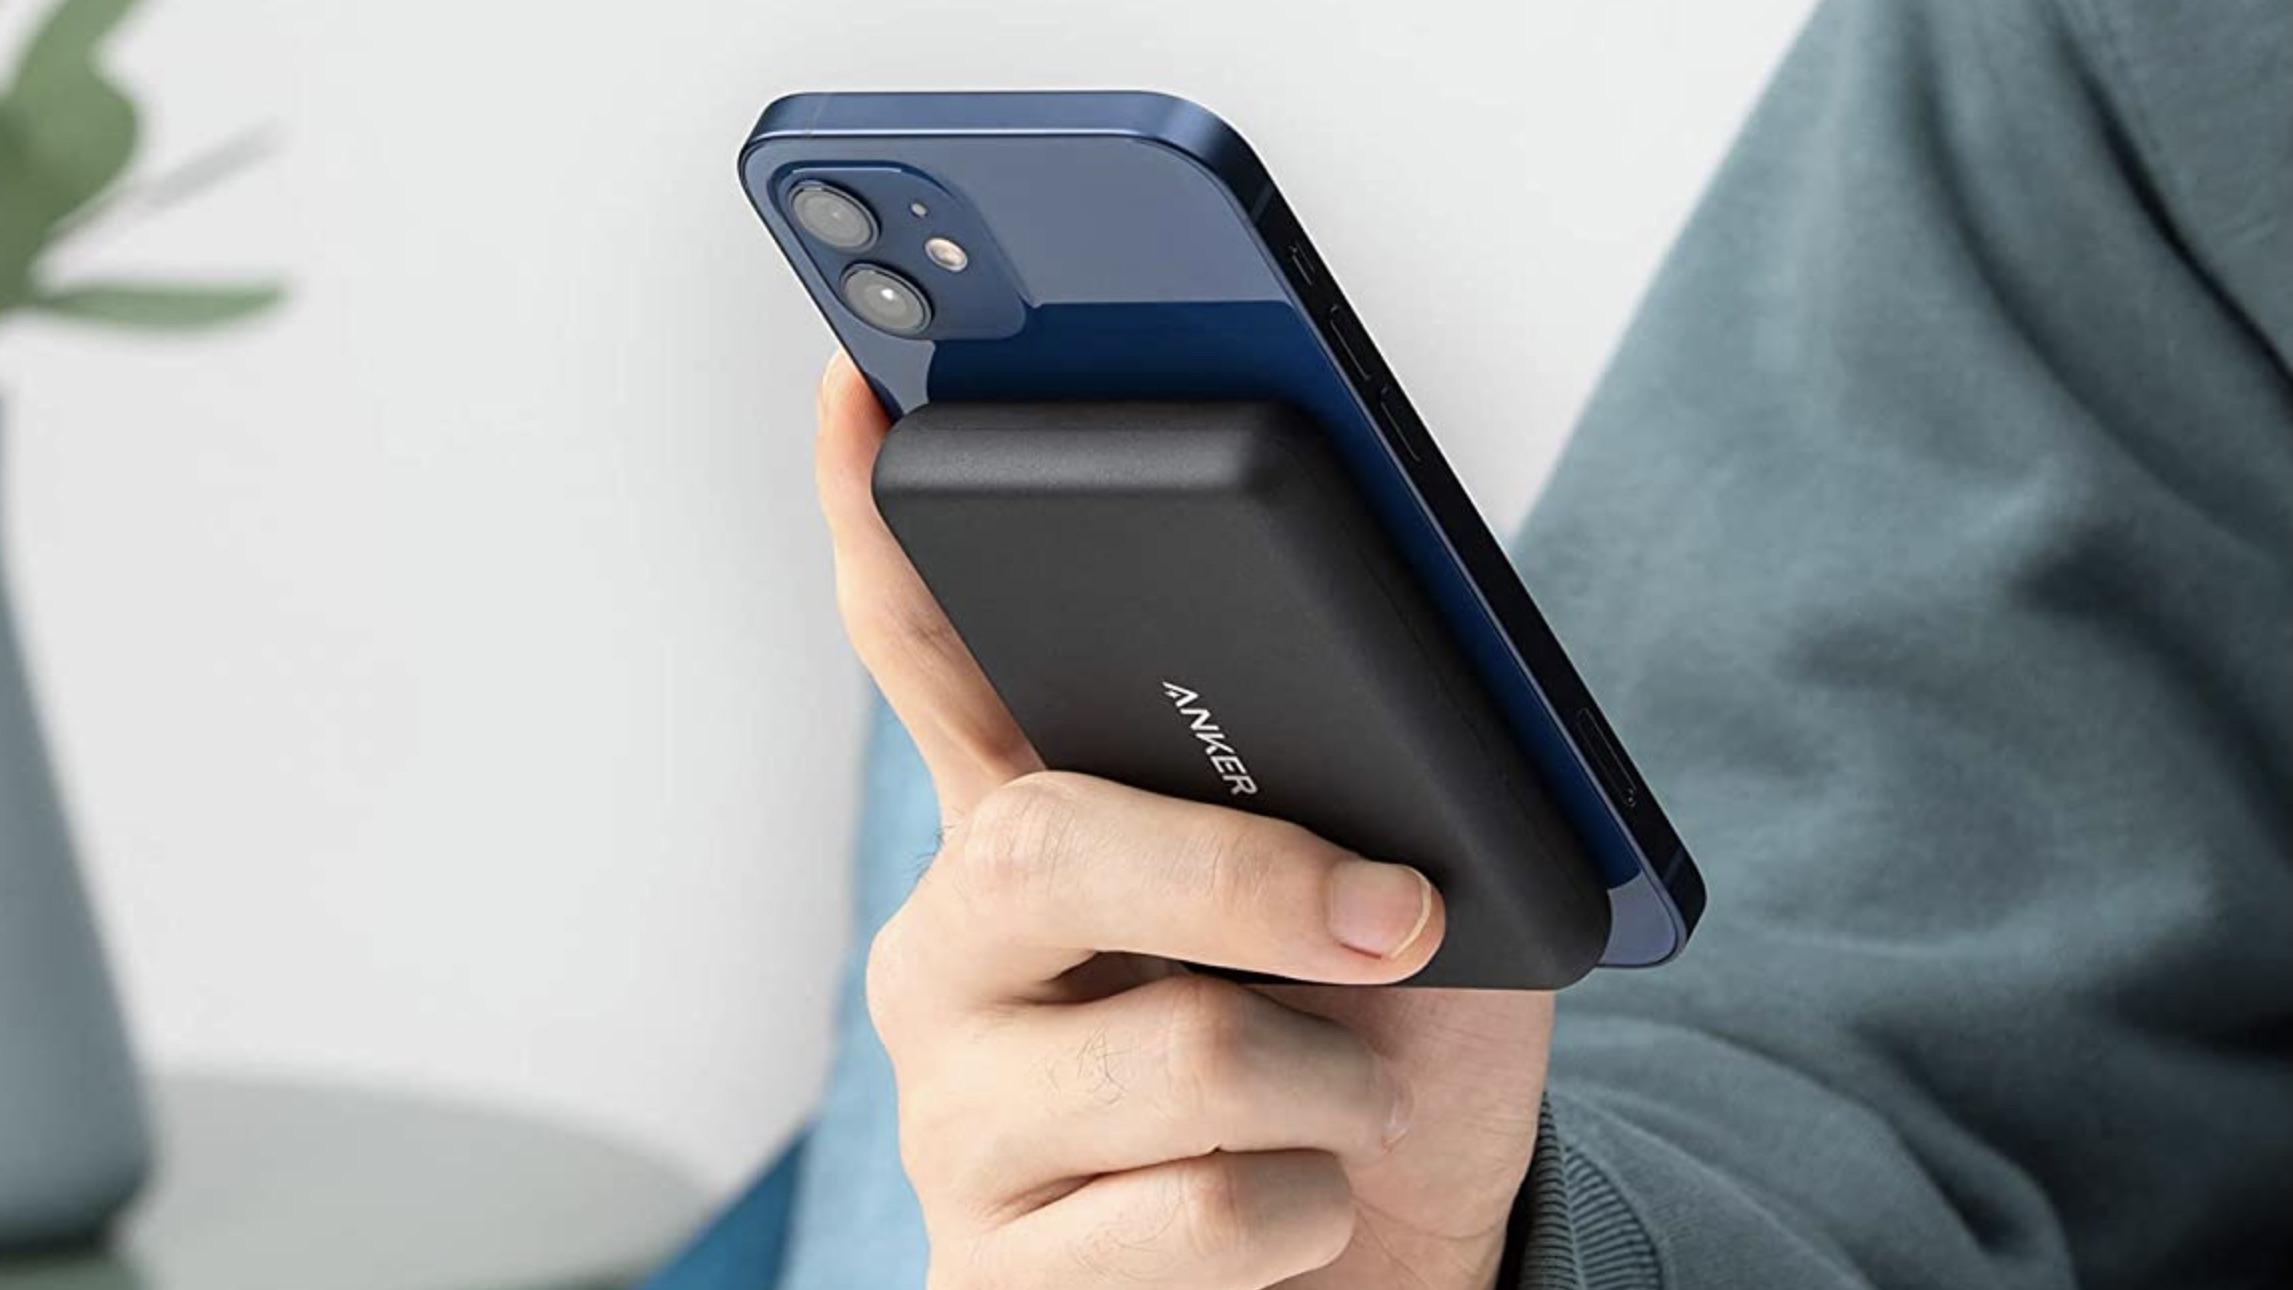 Anker PowerCore Magnetic 5K Wireless Power Bank kiinnittyy iPhone 12 -puhelimiin.